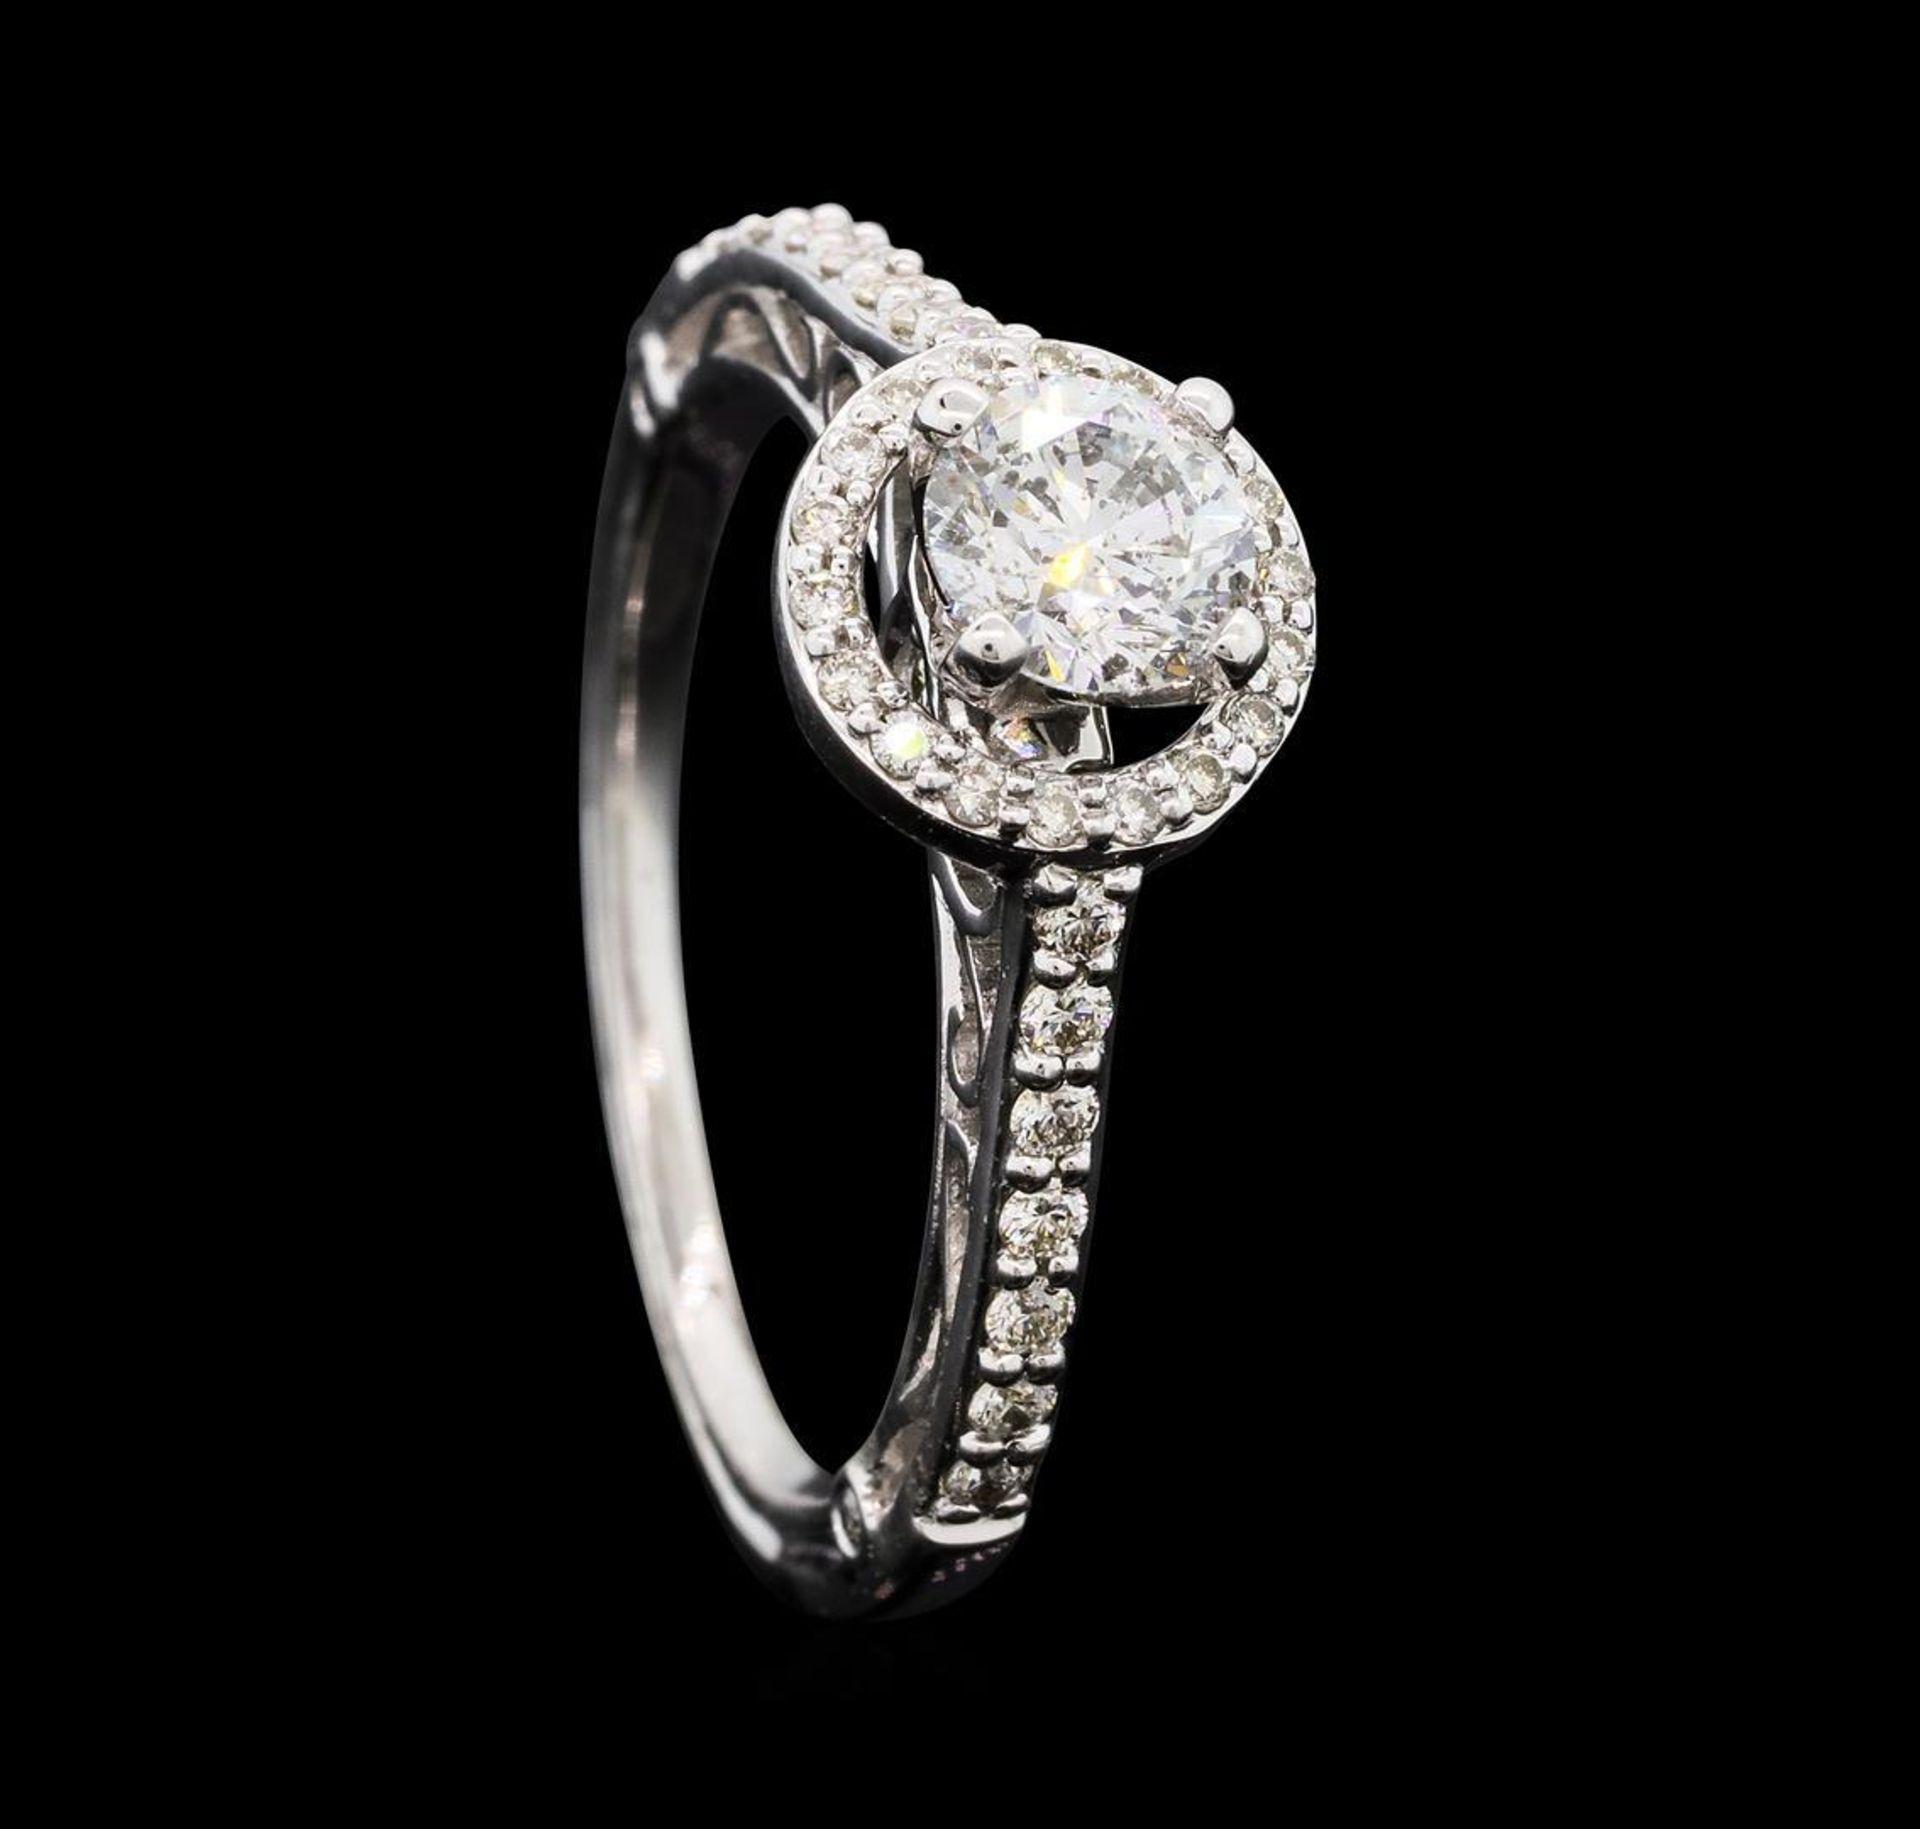 0.79 ctw Diamond Ring - 14KT White Gold - Image 4 of 5